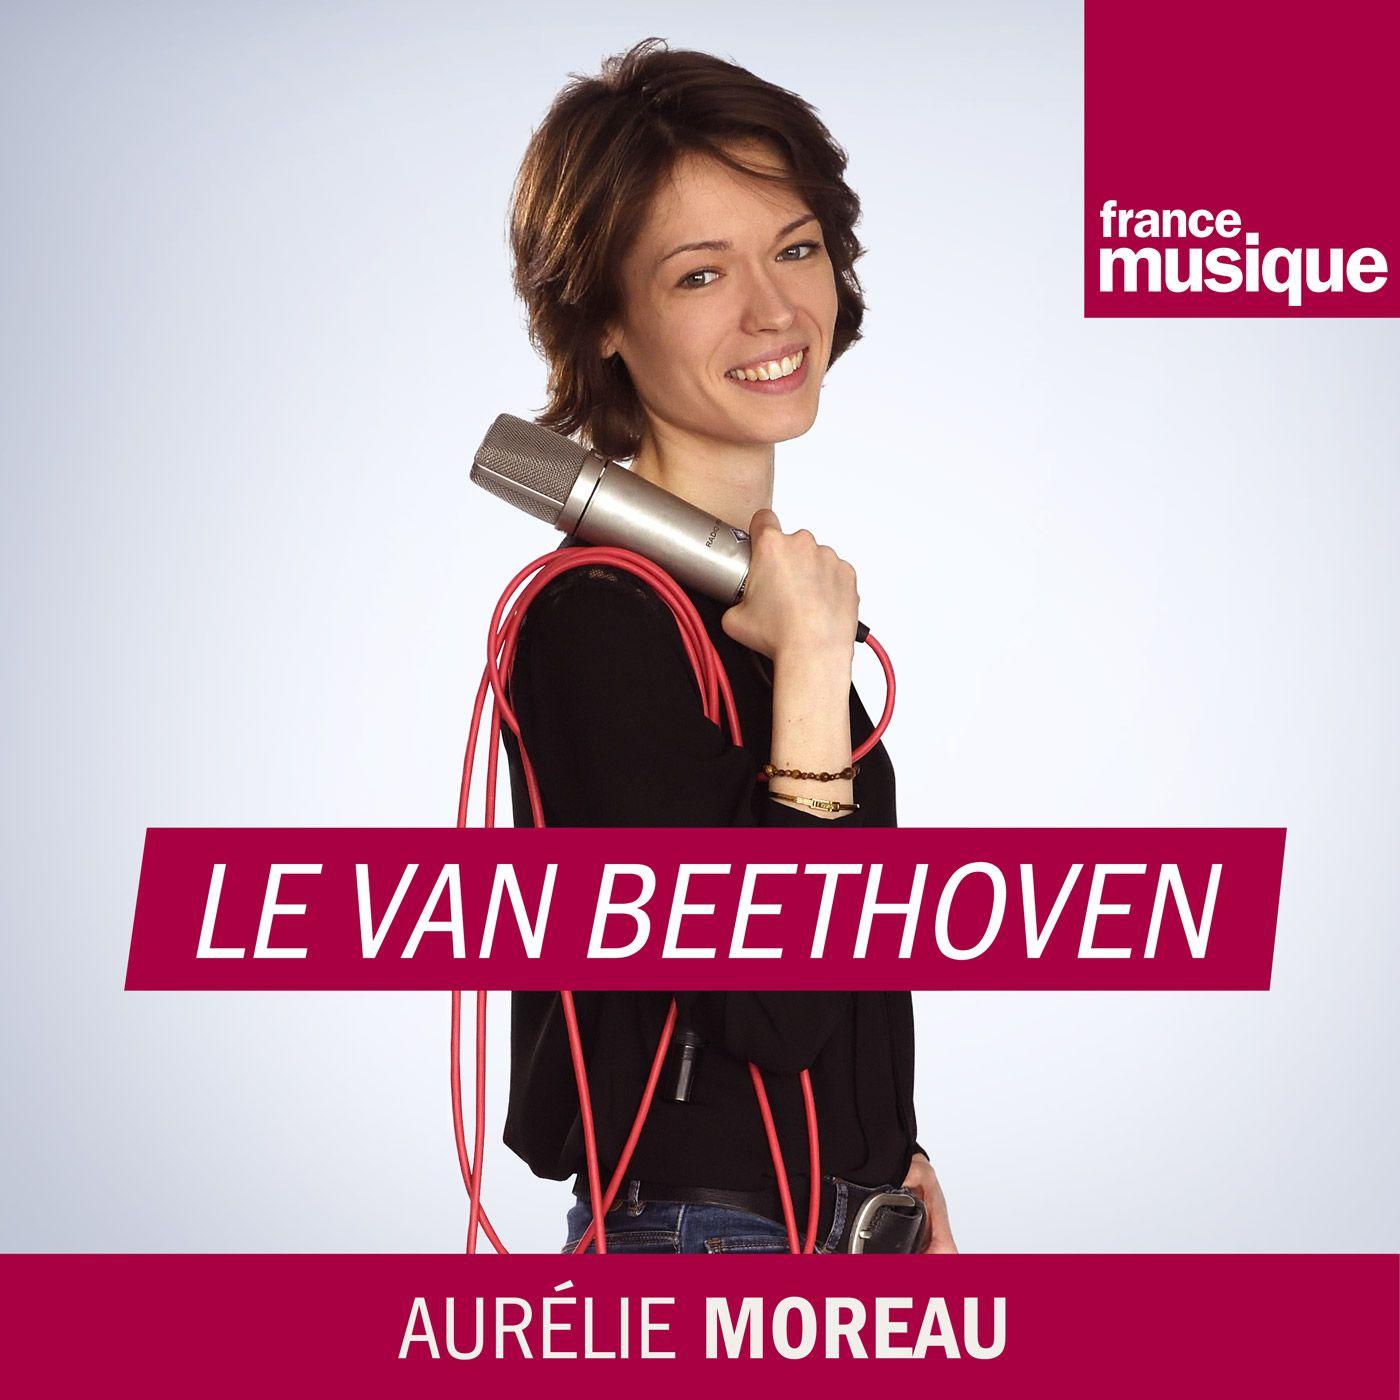 Image 1: Le van Beethoven